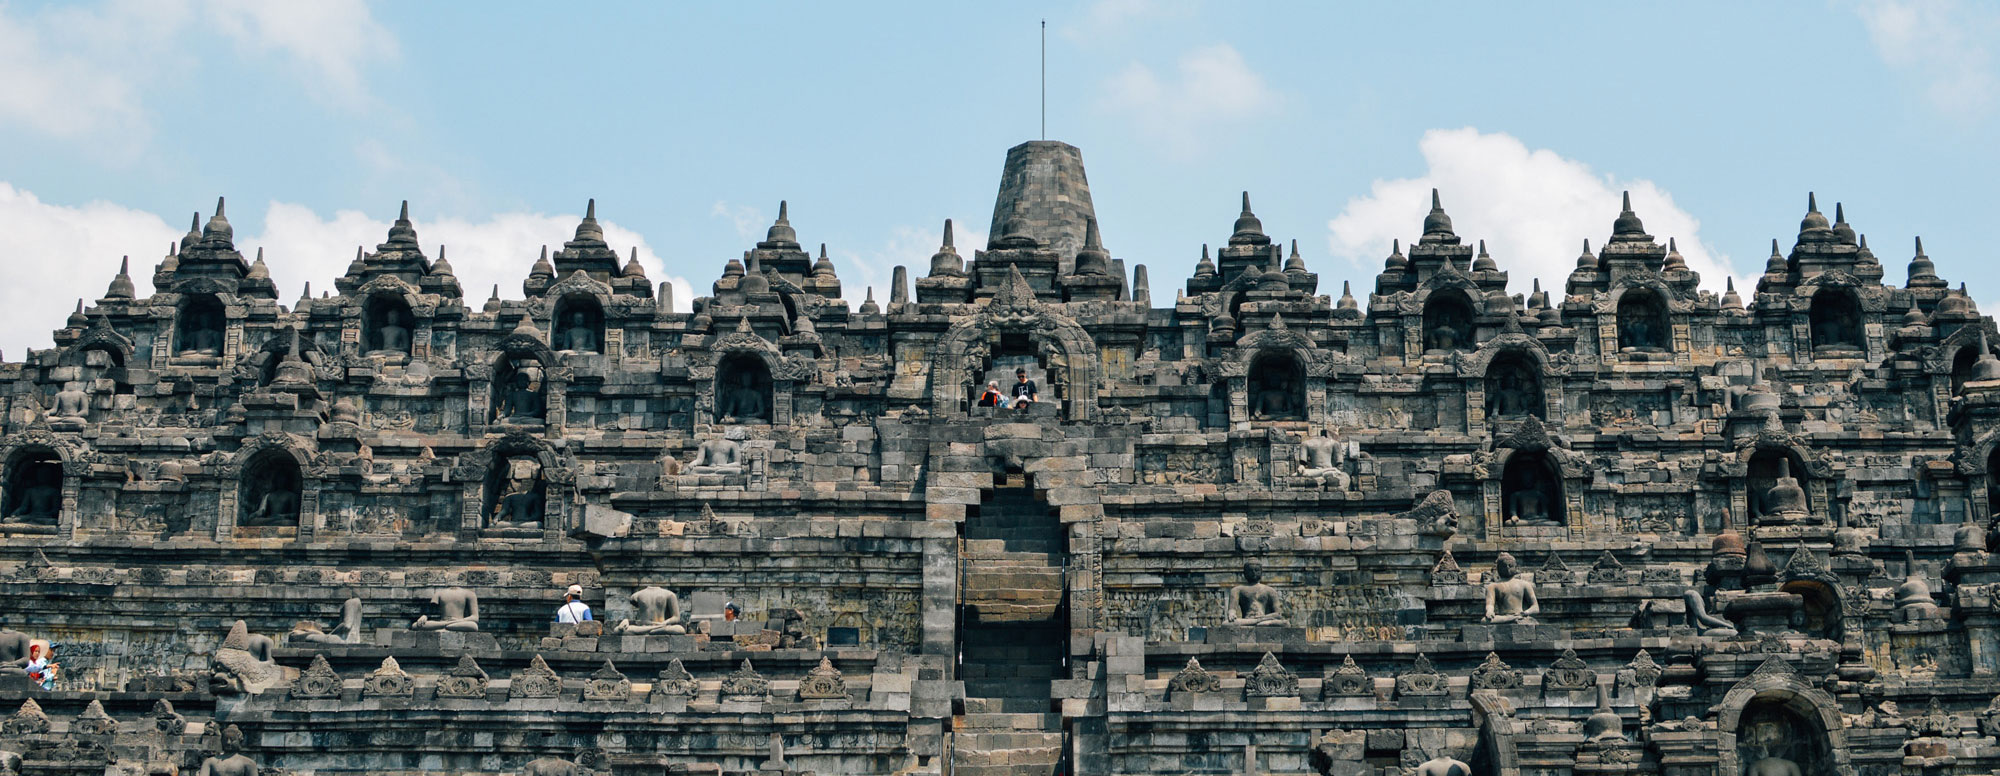 borobudur2 - Jogyakarta with Temples